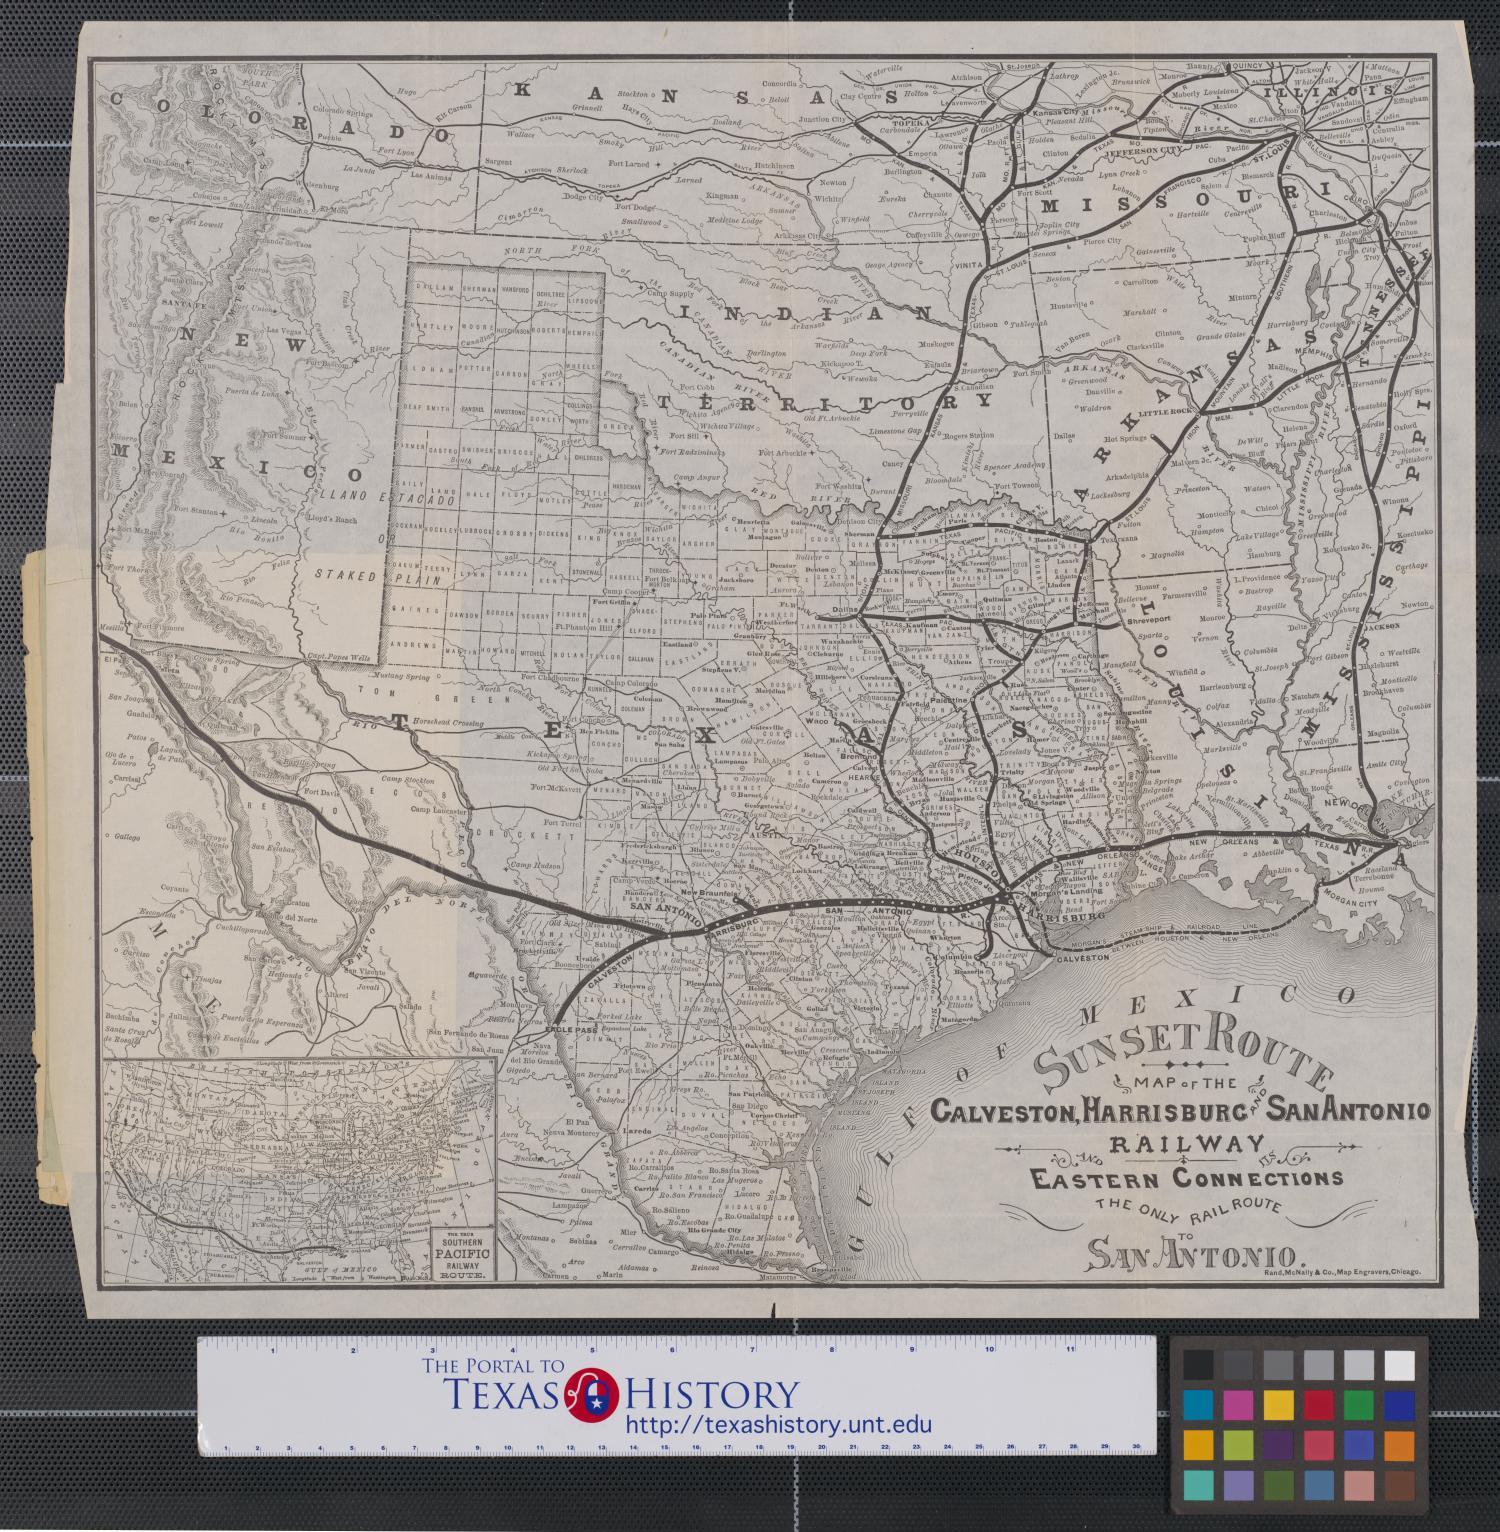 Map of the Galveston Harrisburg and San Antonio Railway and its